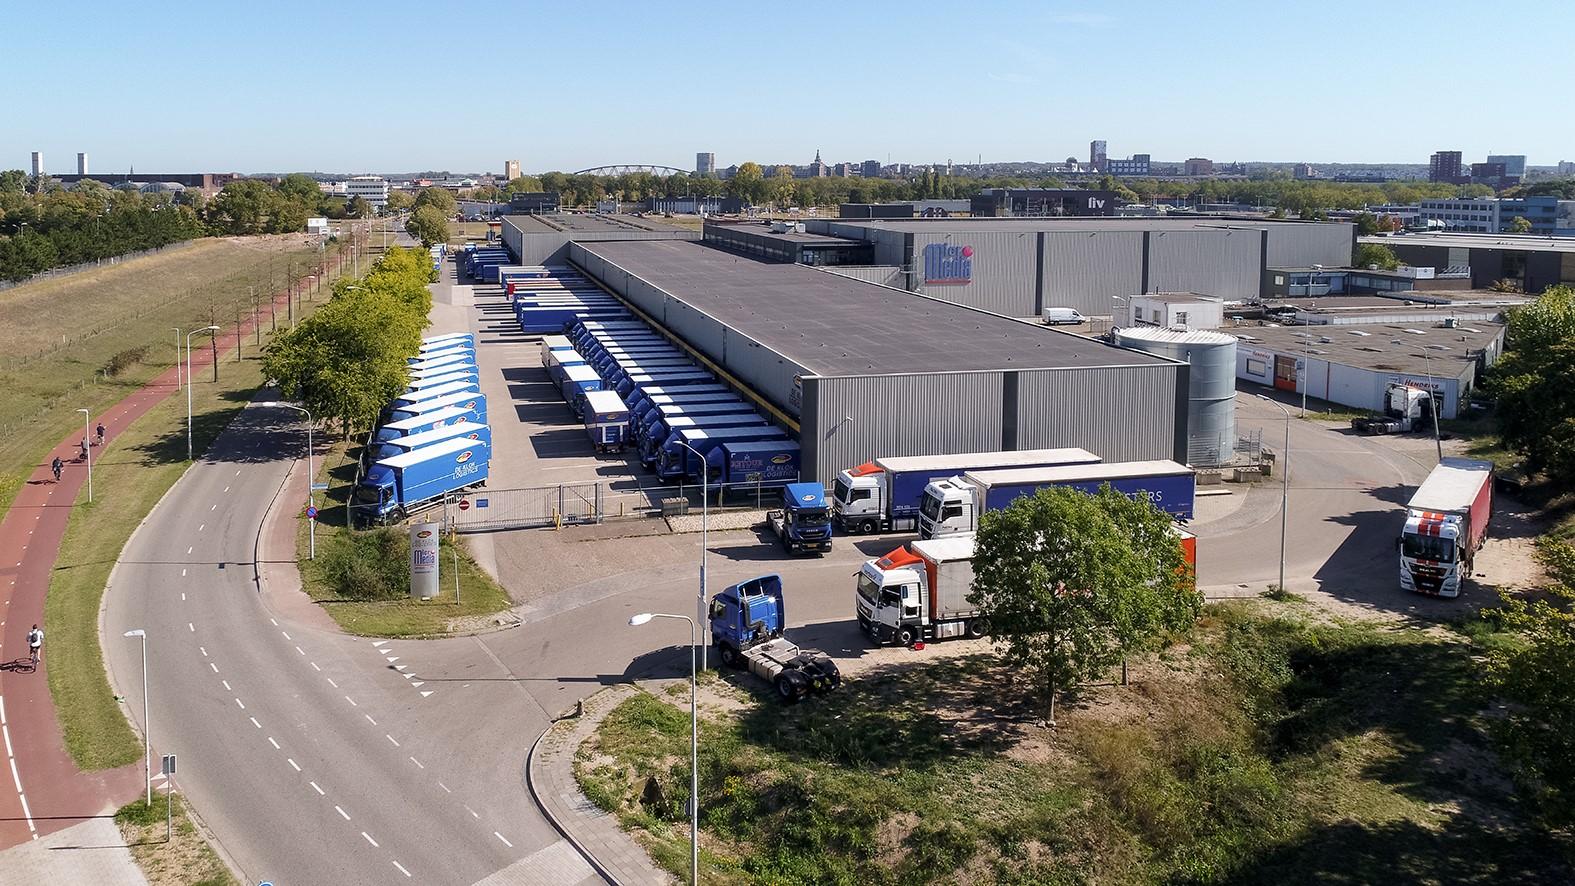 VDG Real Estate verkoopt twee warehouses van in totaal 32.200 m2 in Nijmegen aan Granite